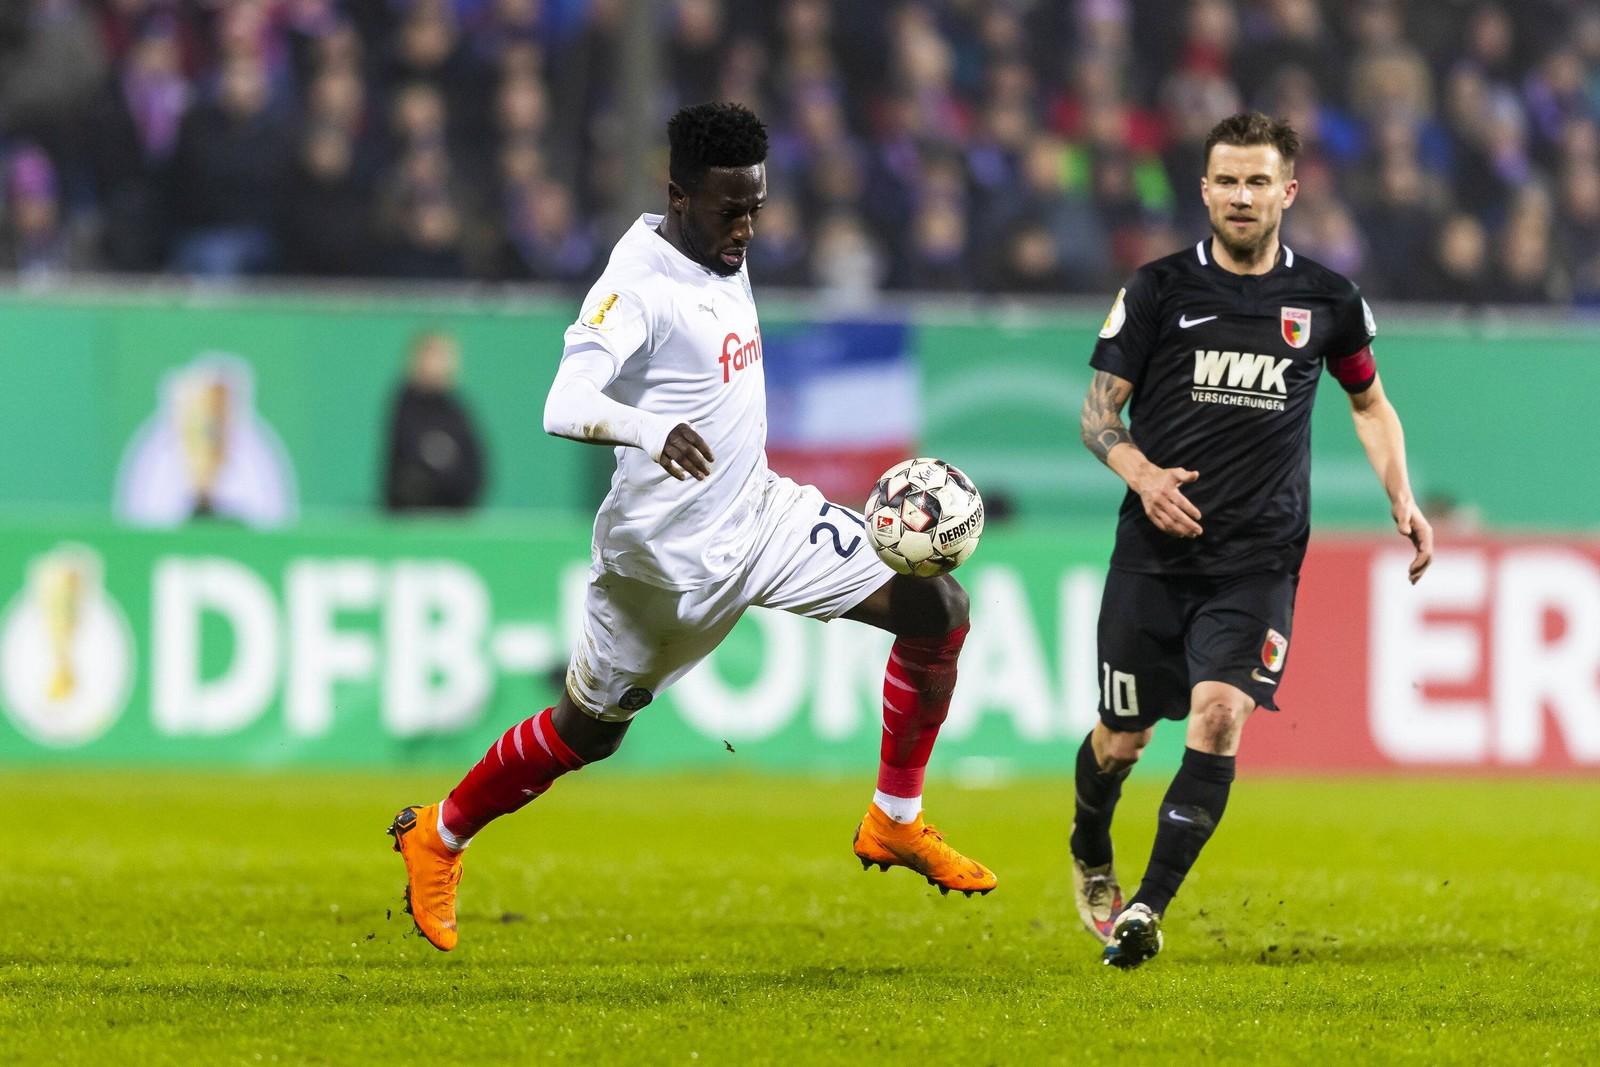 Kingsley Schindler im Pokal gegen Augsburg.